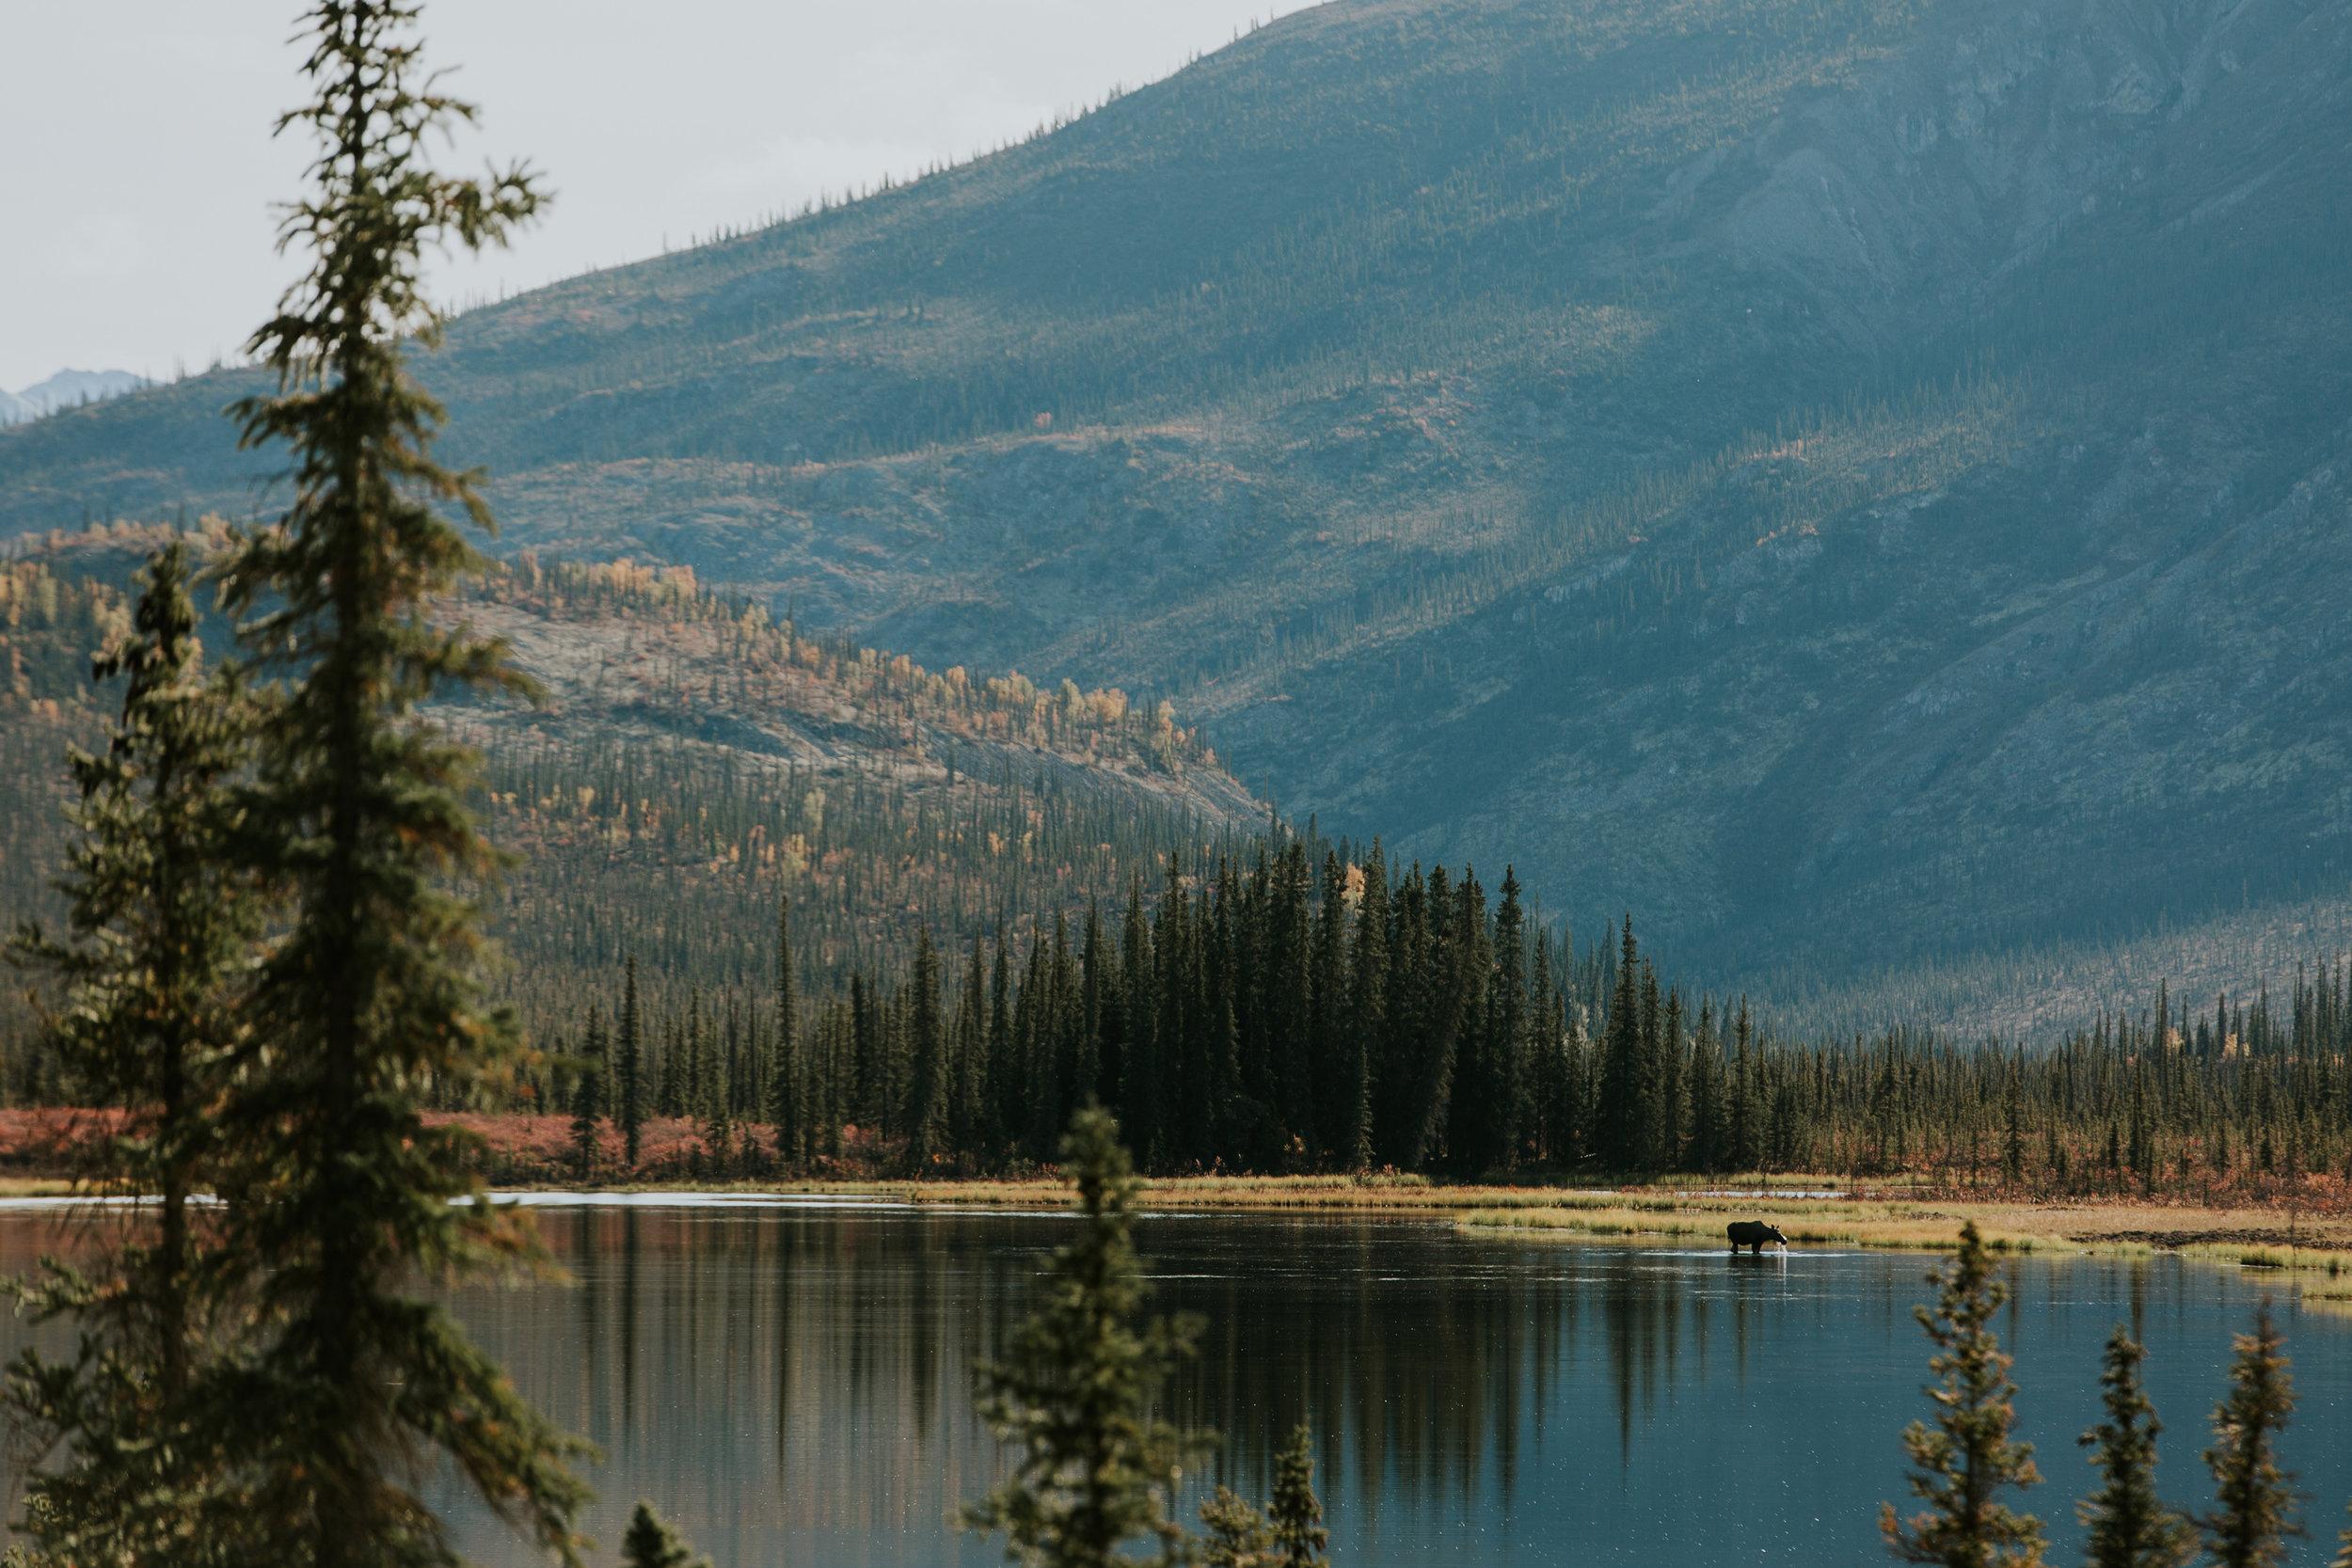 CindyGiovagnoli_Alaska_KoyukukRiver_SukakpakMountain_JimRiver_ArcticCircle_fly_fishing_September-008.jpg